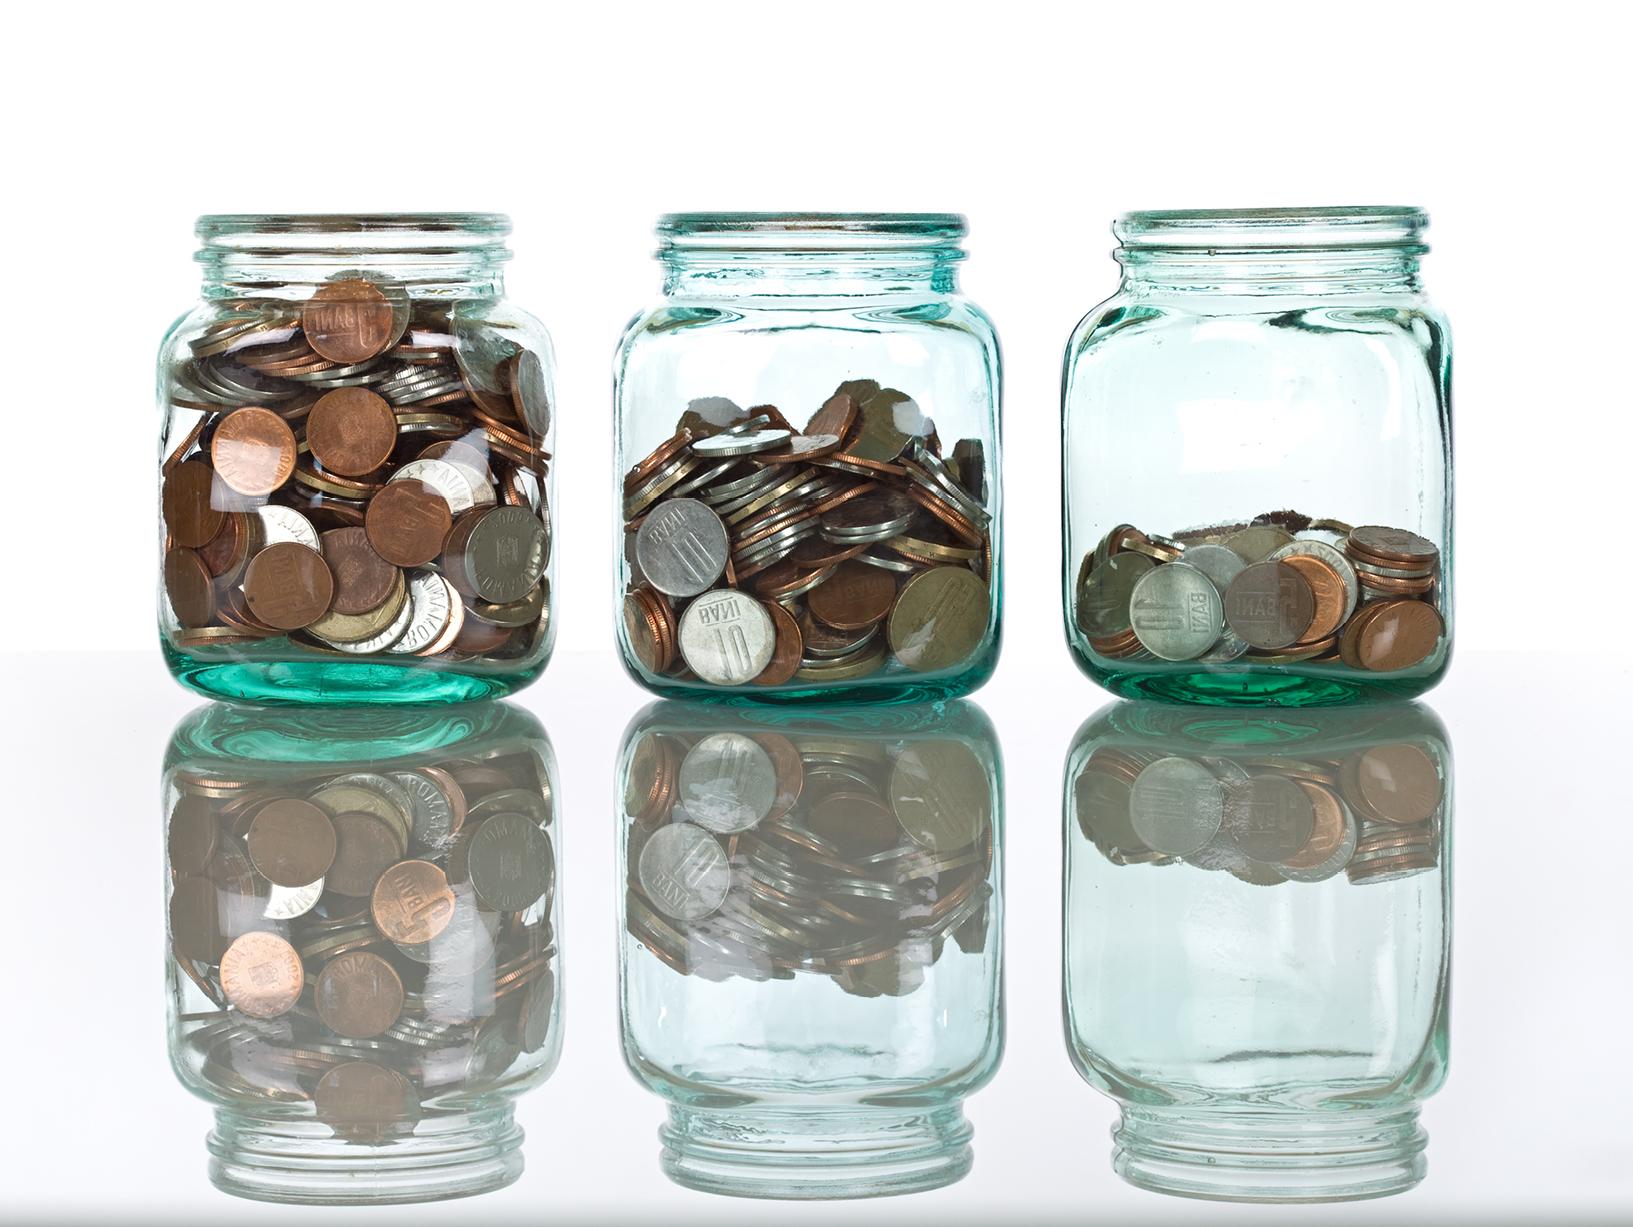 jars with change